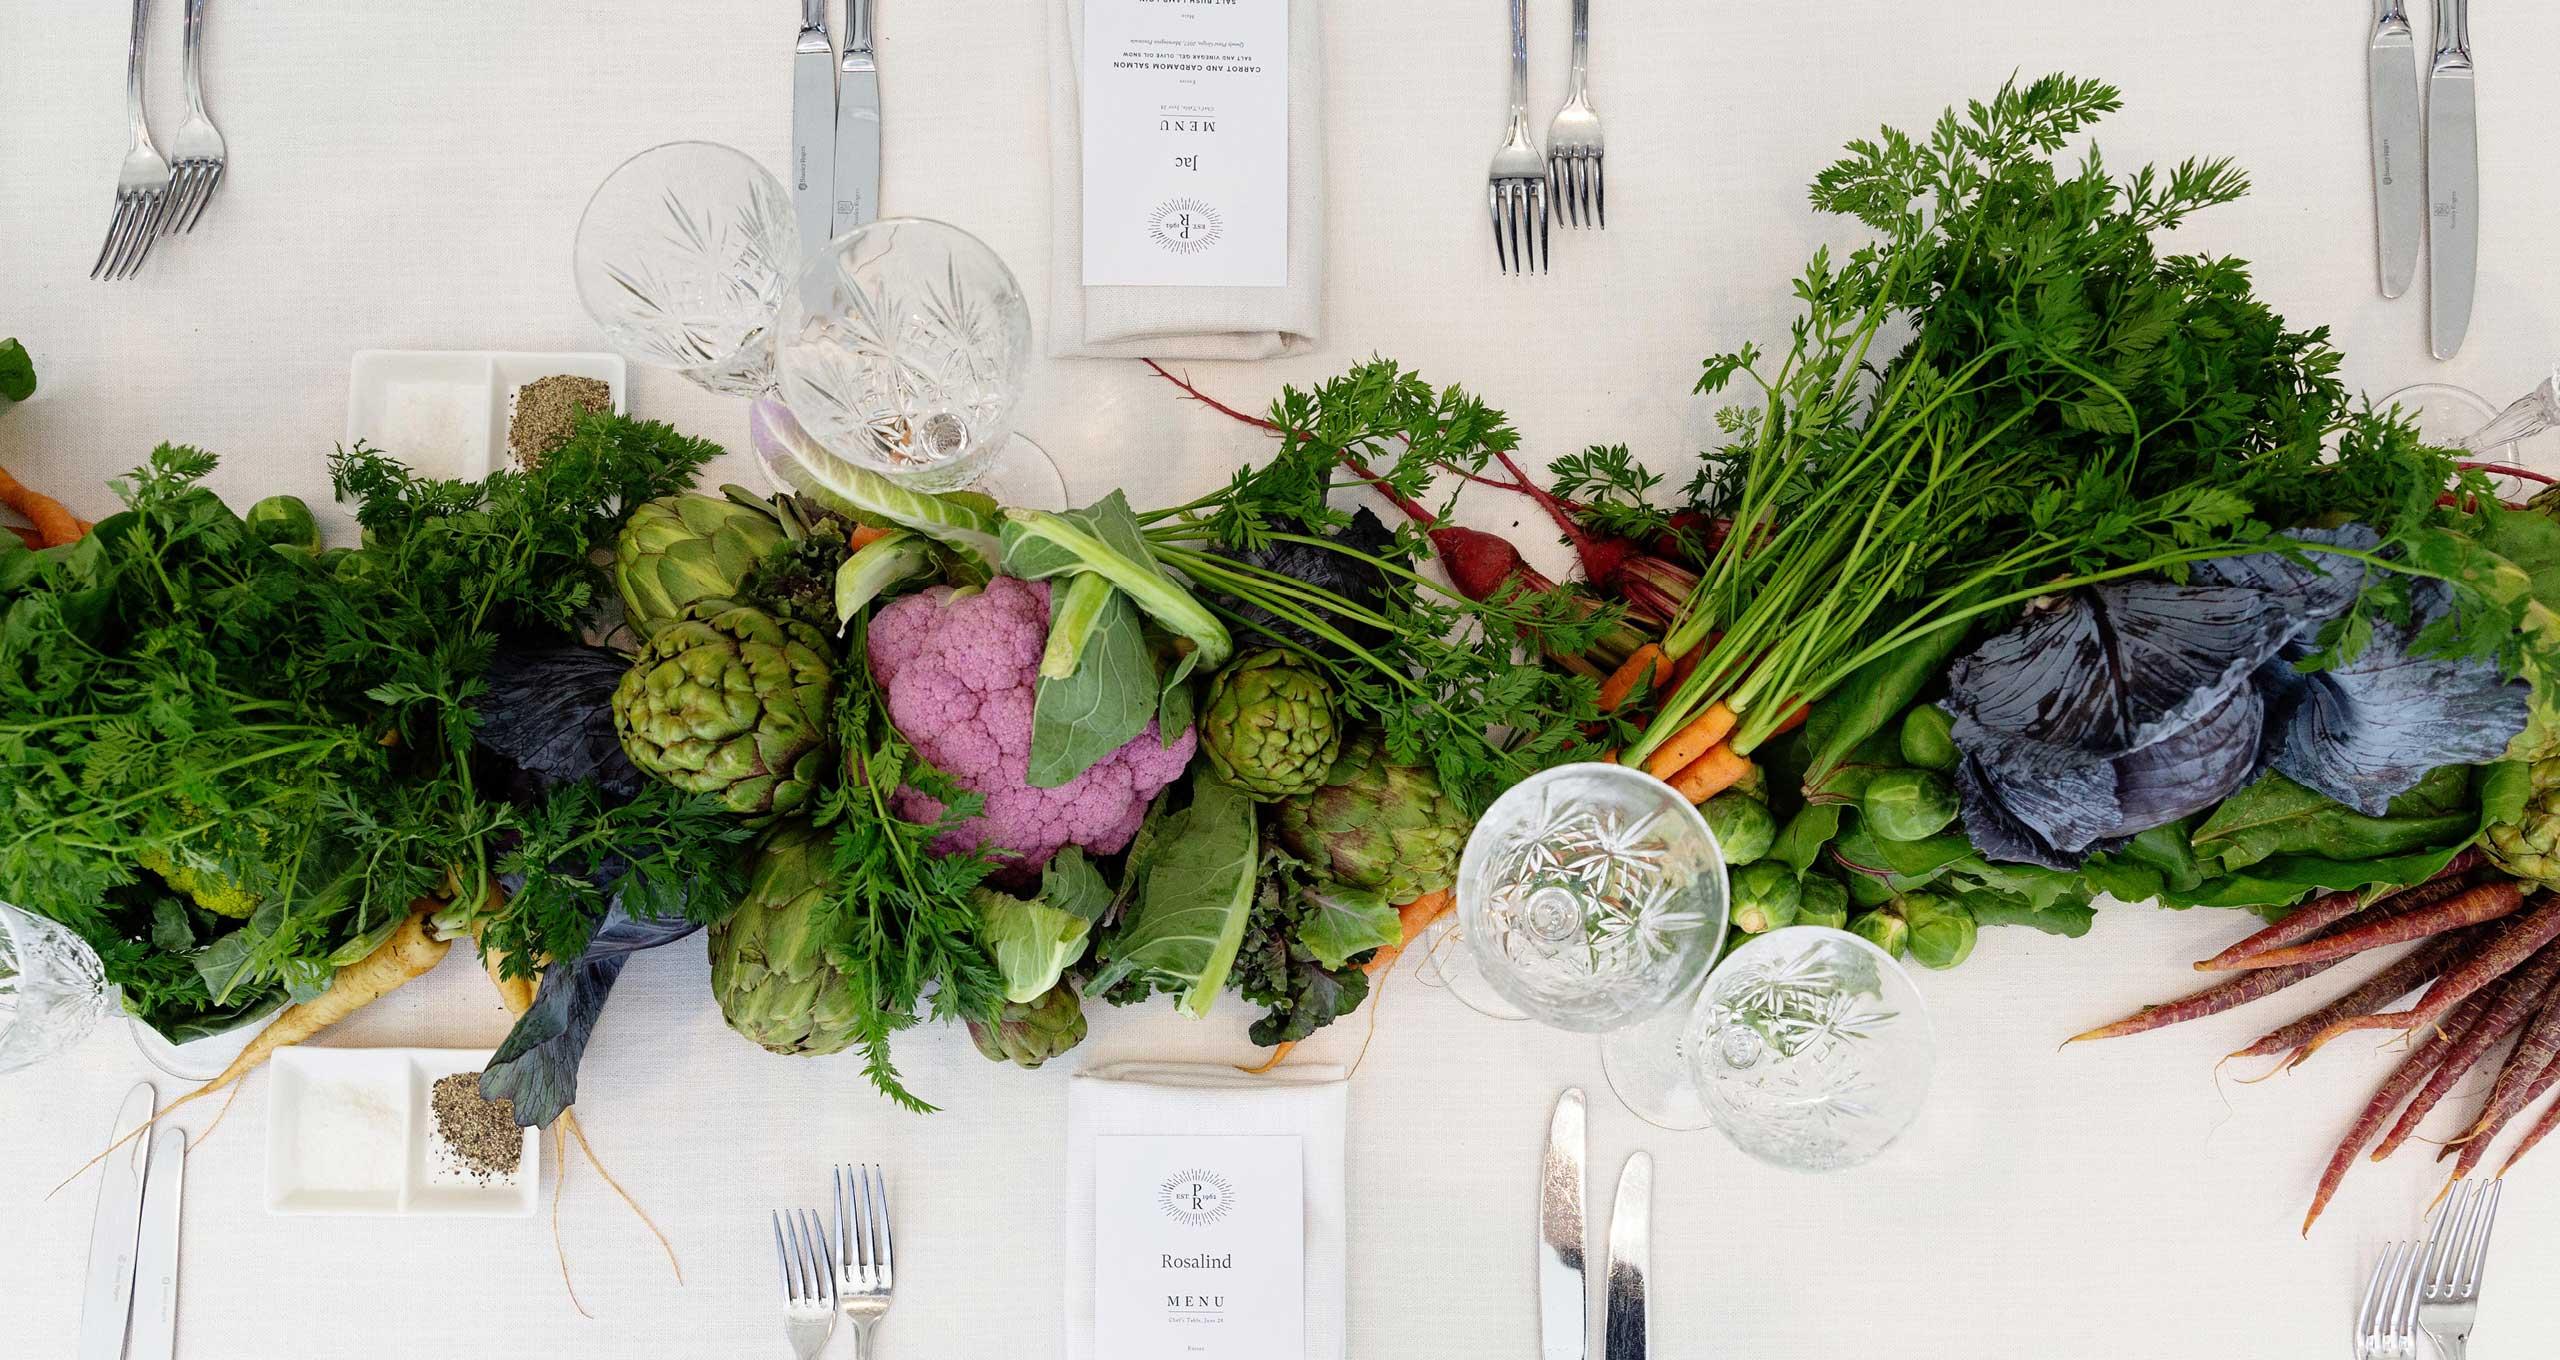 Table runner made of fresh produce